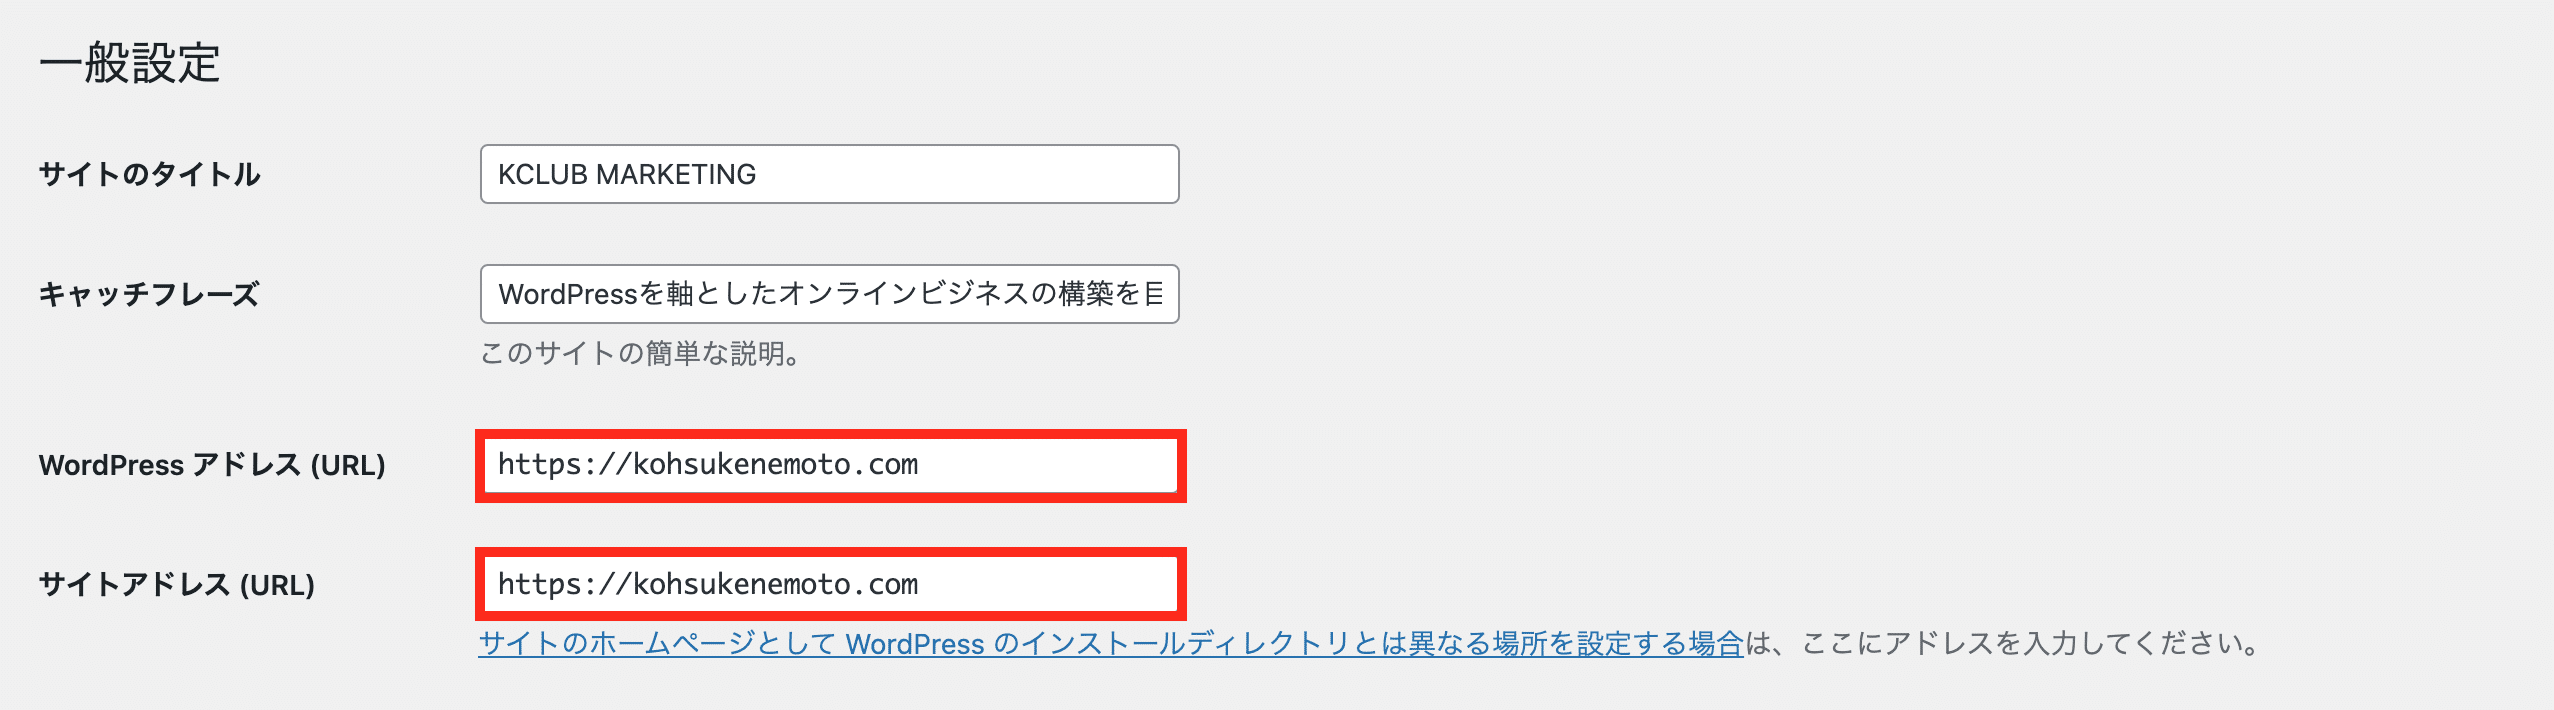 WordPressでWordPressアドレスとサイトアドレスを変更する